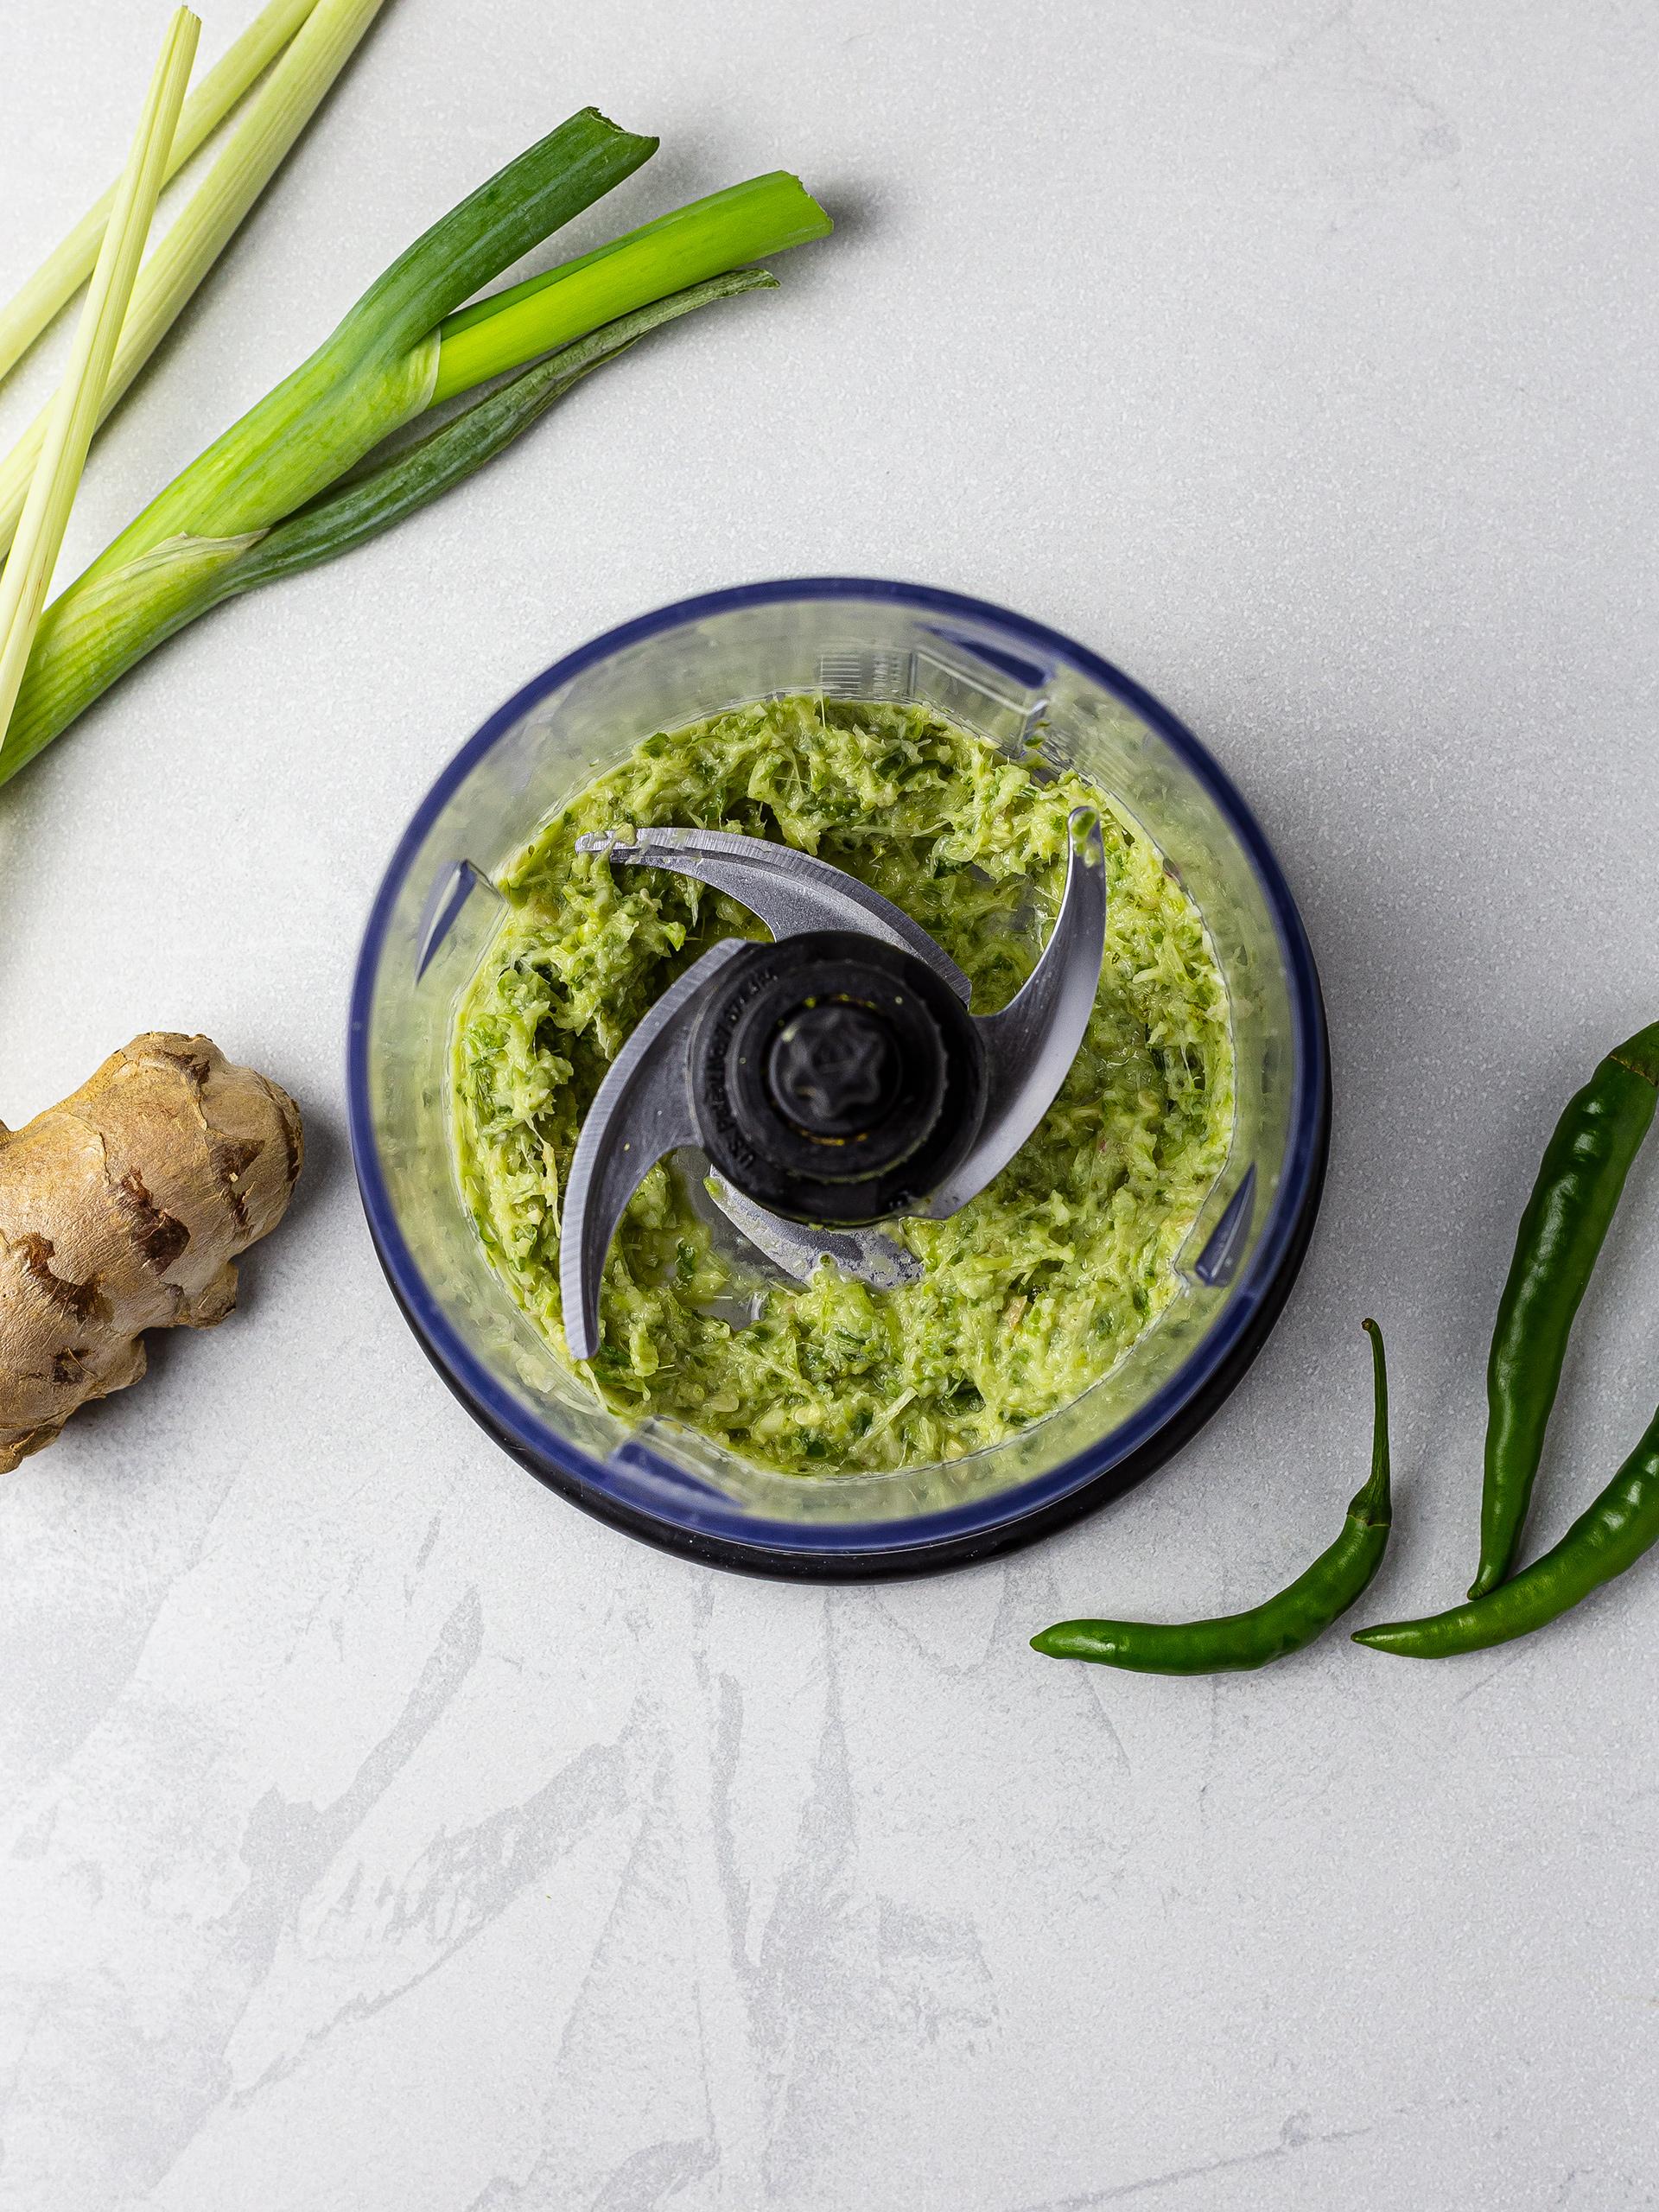 Thai chili sauce with ginger and lemongrass